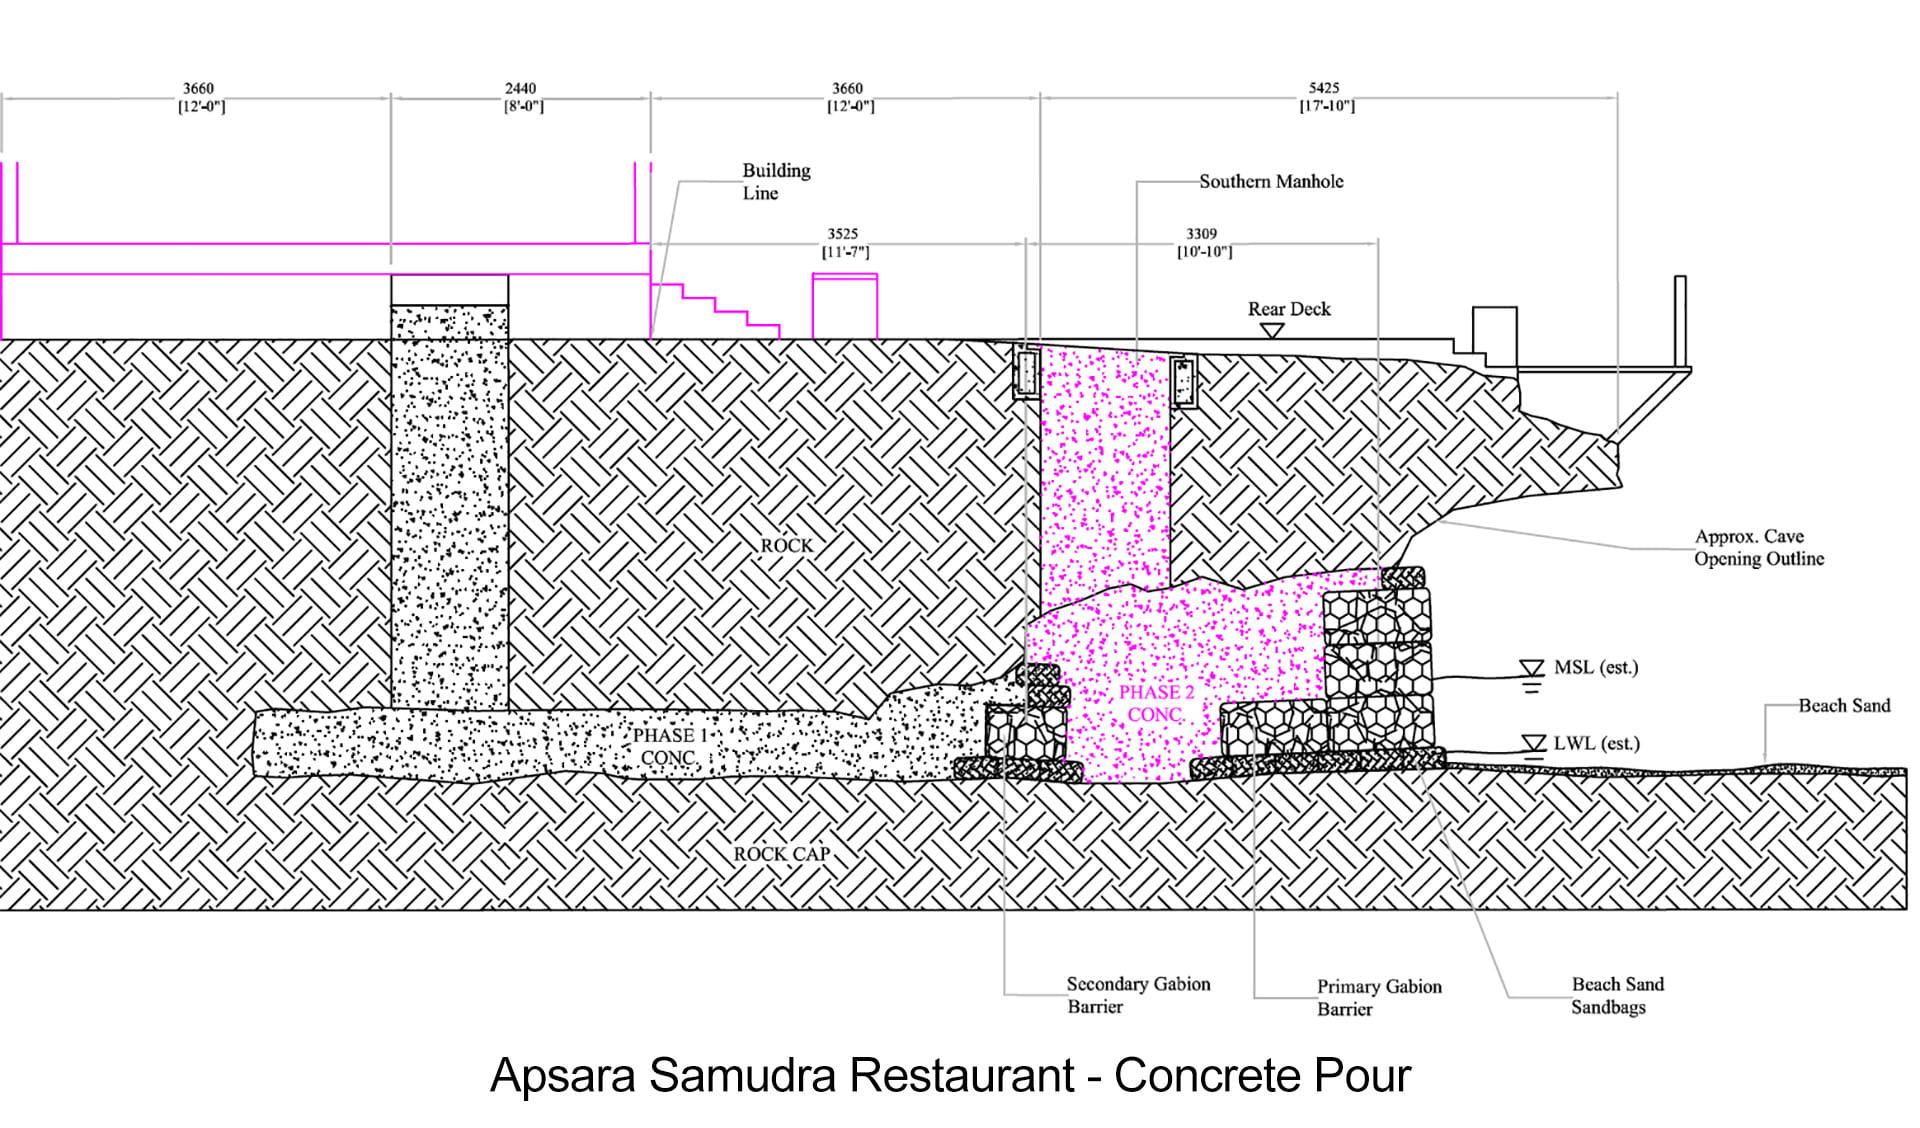 Specialised Marine Work Apsara Marenco Restaurant Schematic Project Samudra Christ Church Barbados